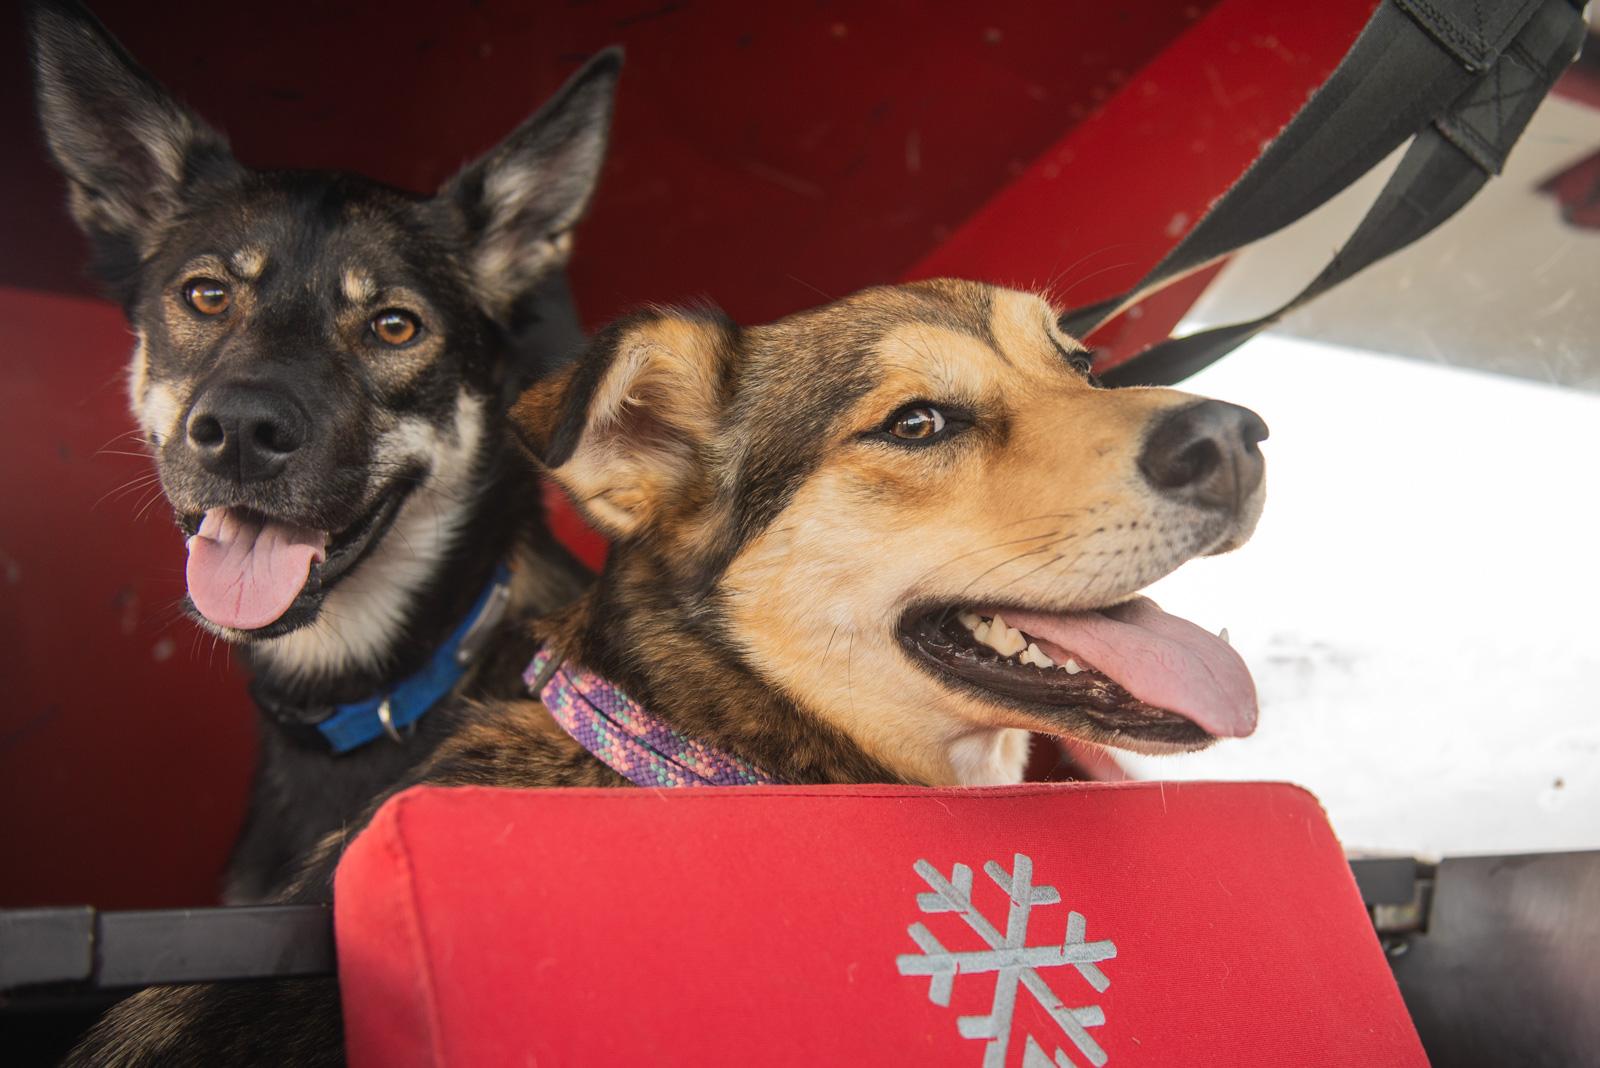 Meredith Berg Photography Anchorage Alaska Dog Pet Photographer Hazelnut Husky Mix Knik Glacier_DSC5535.jpg